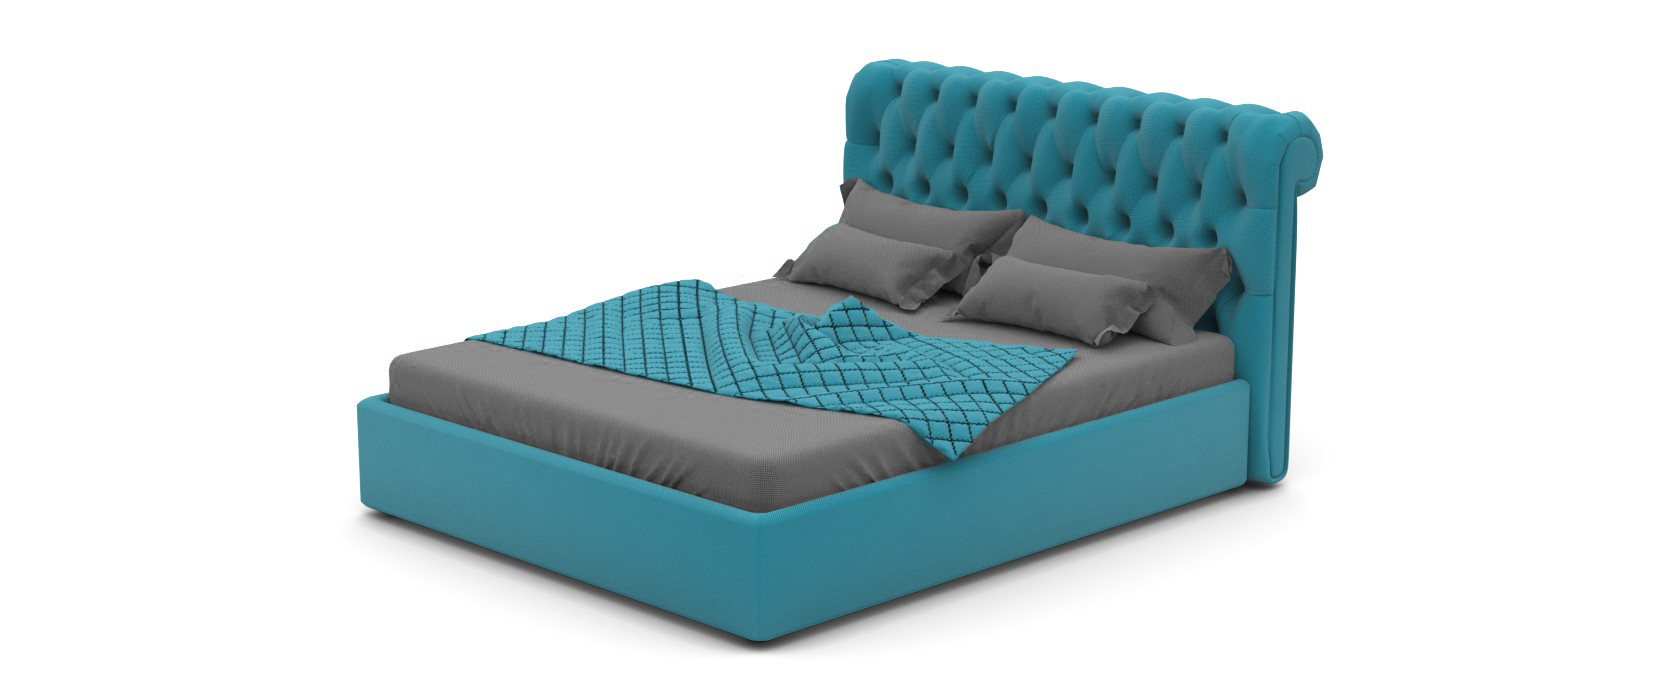 Кровать Milania - Pufetto